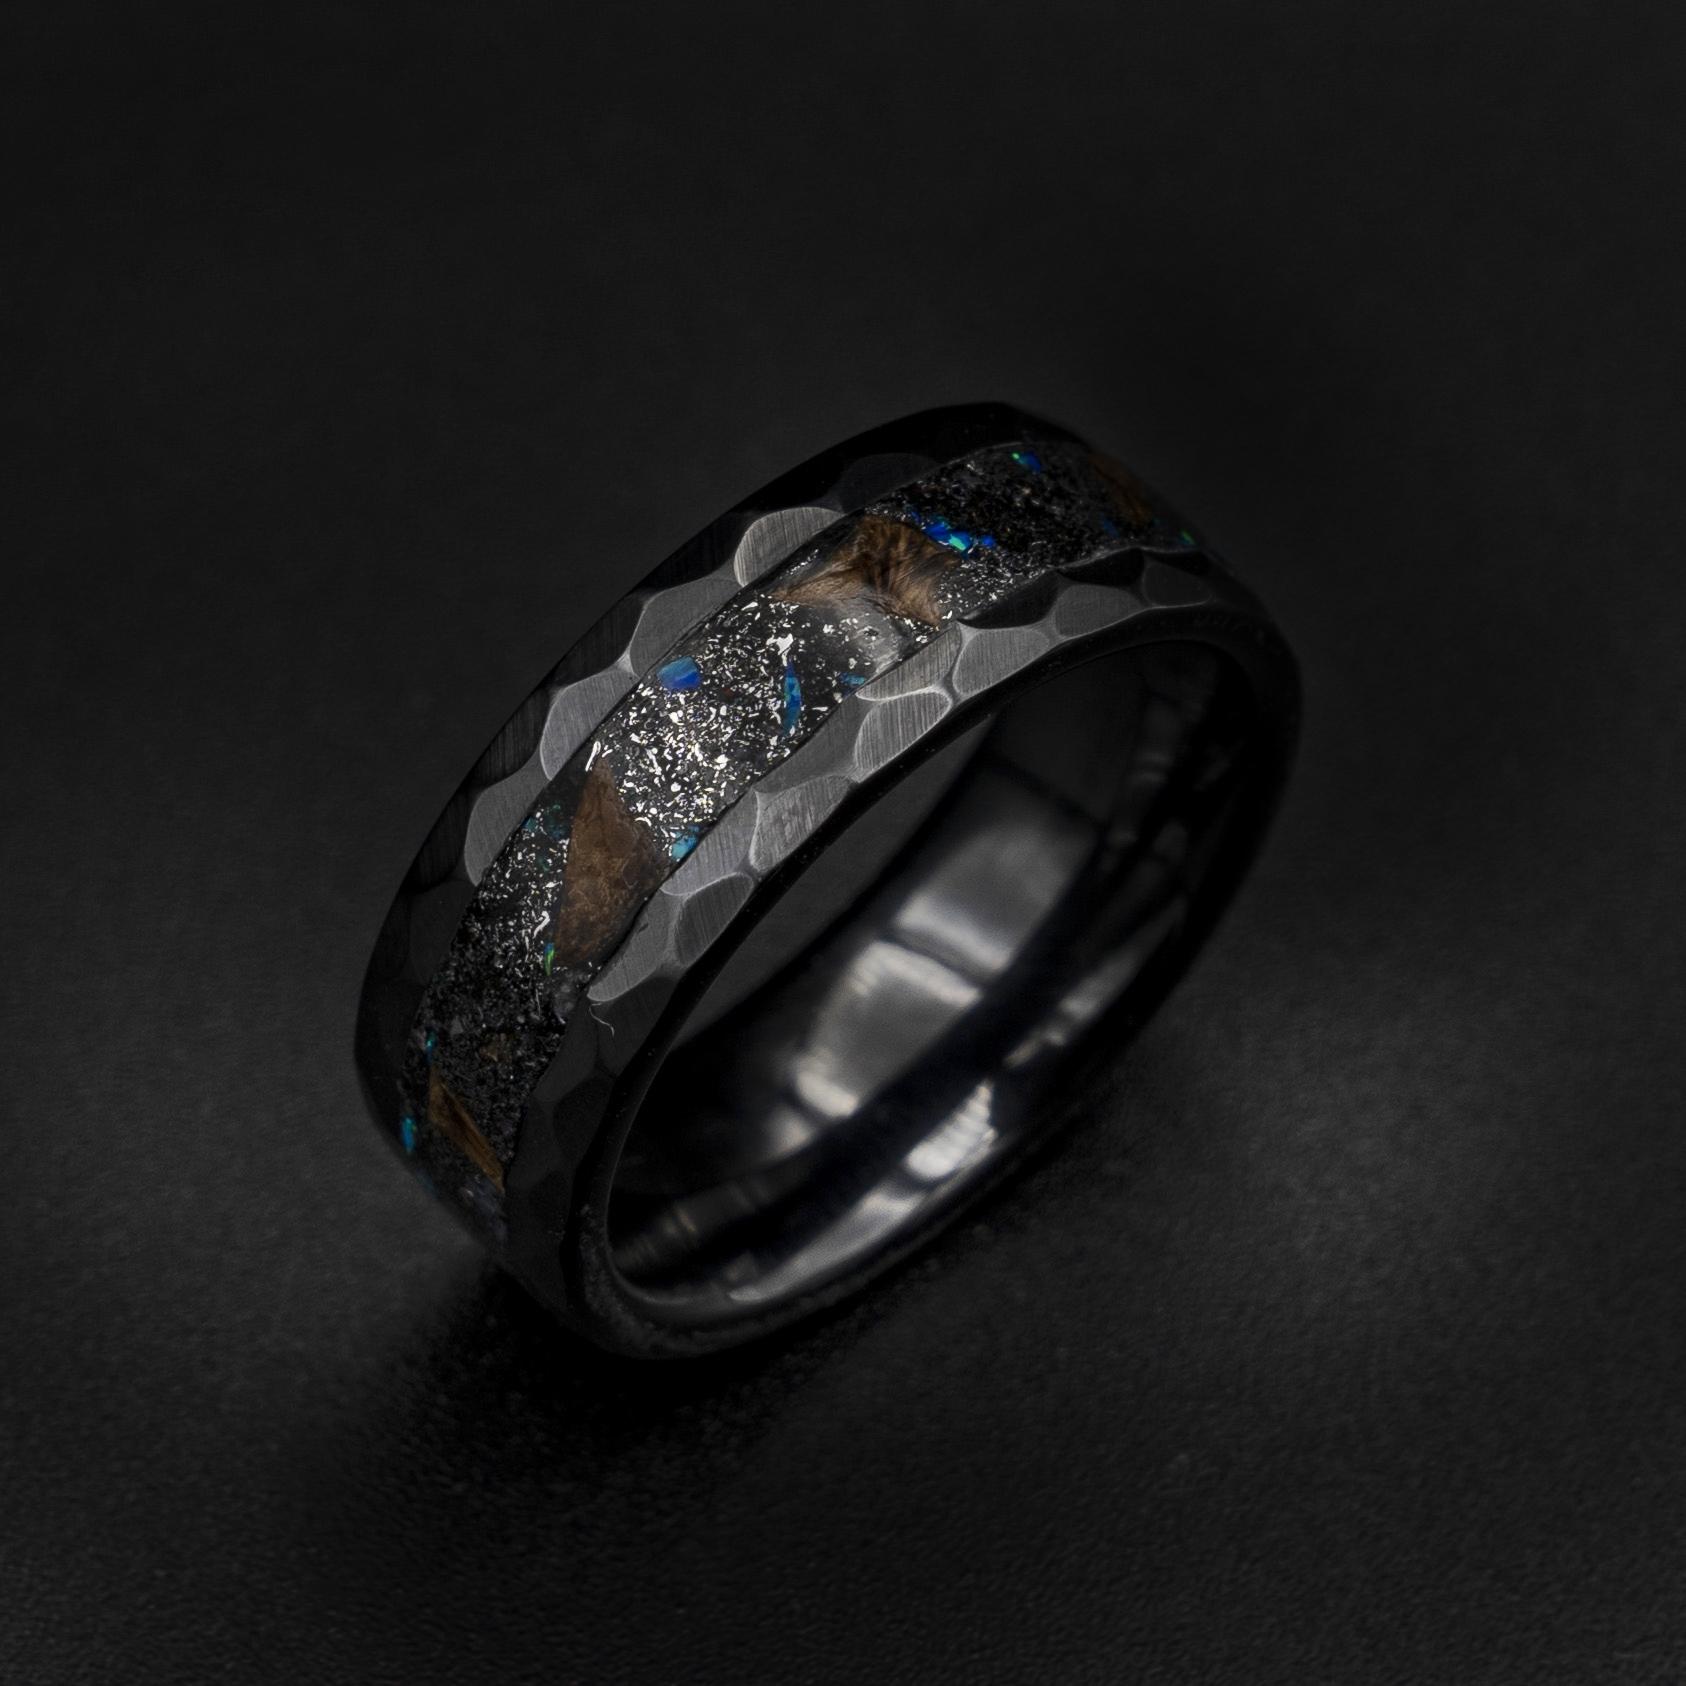 Gift Ring Custom Ring Women Ring Flat Ring Couple Ring Prehistoric Paleo Tungsten Band Stylish Ring Triceratops Ring Engraved Ring